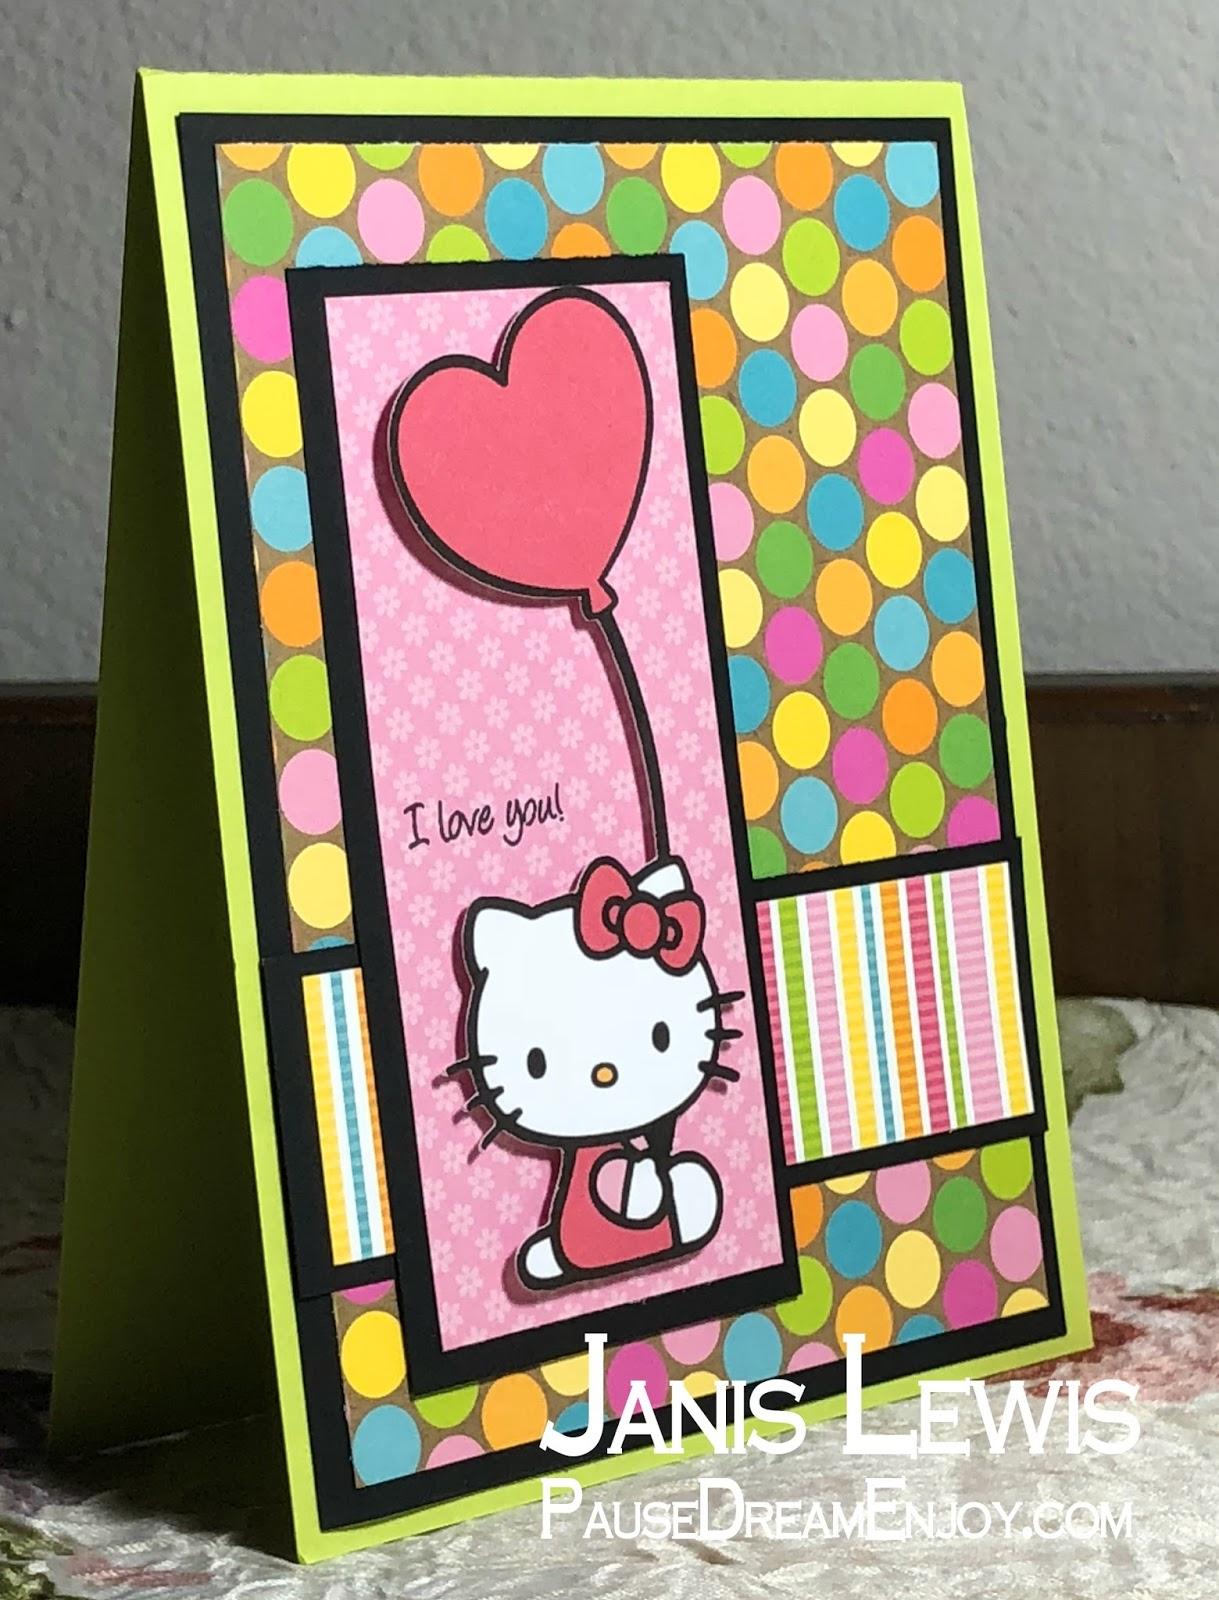 Pause dream enjoy bbtb2 cricut cartridge sanrio hello kitty greetings cardz tv stamps mini messages m4hsunfo